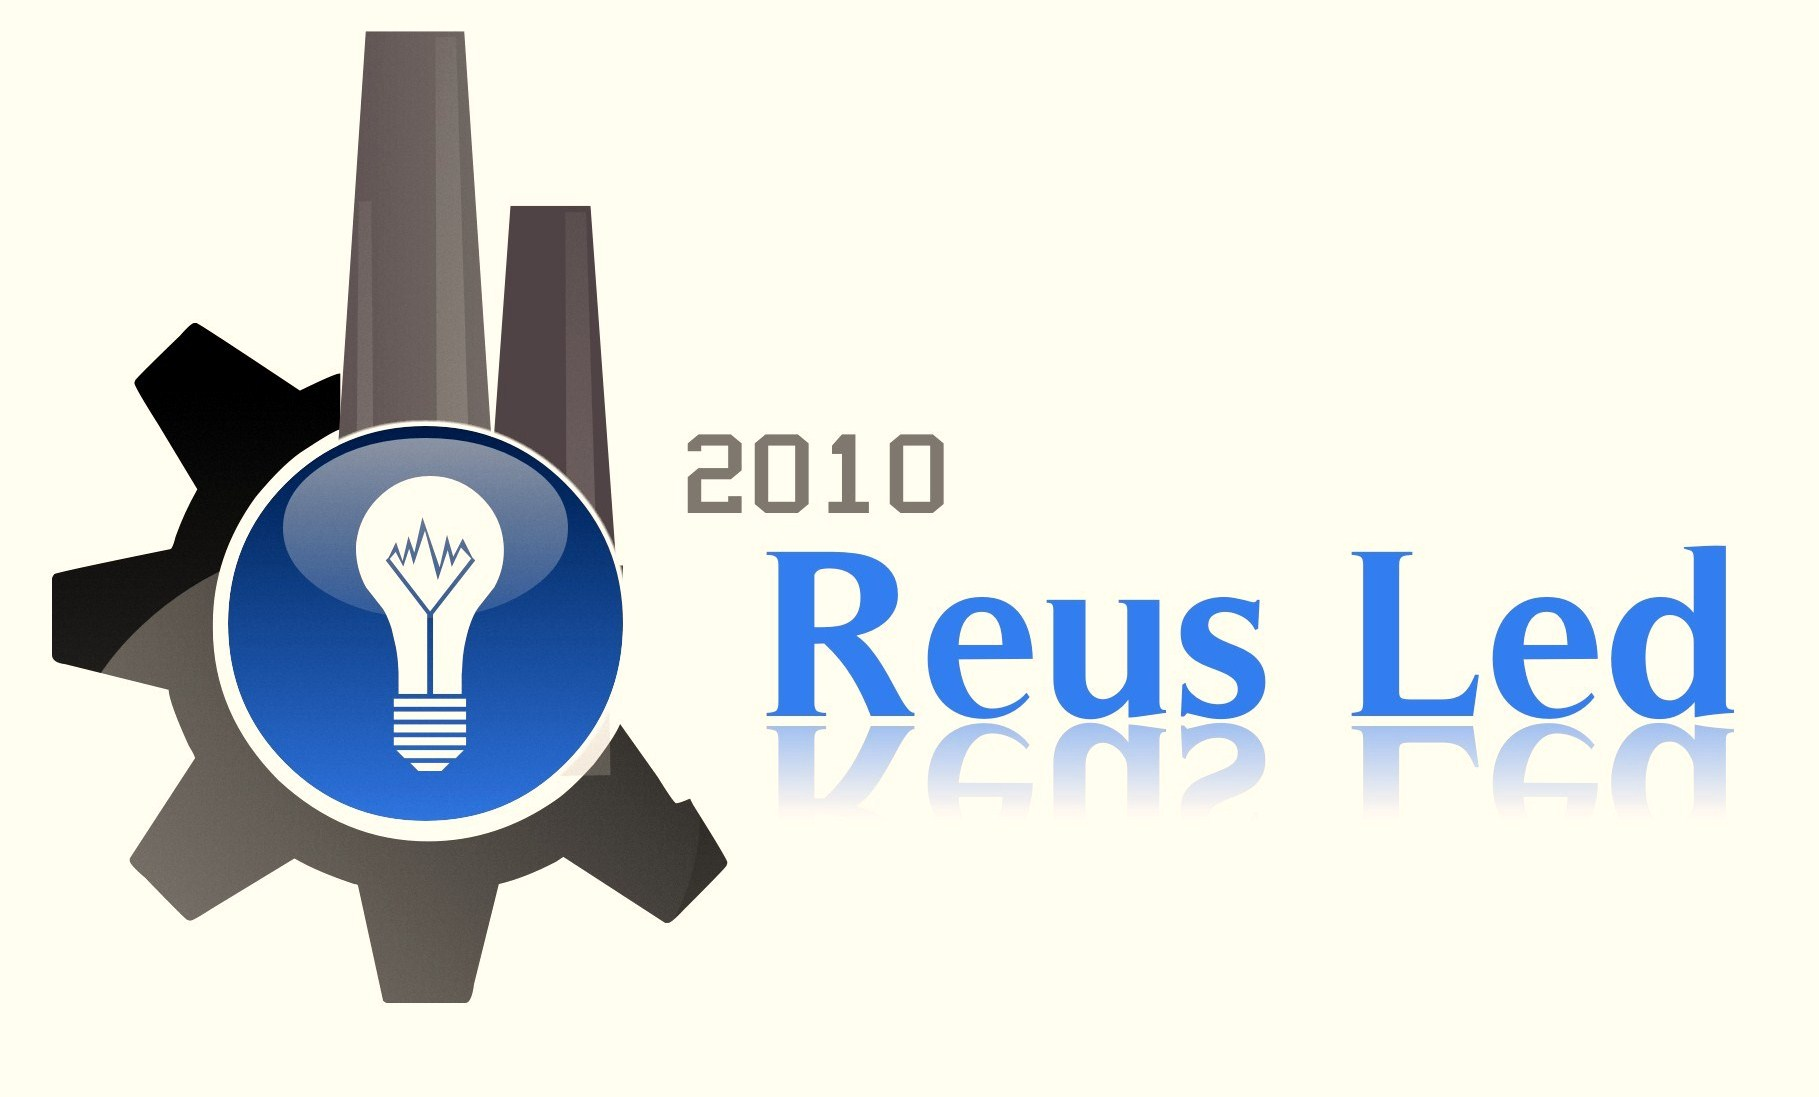 Reus Led 2010